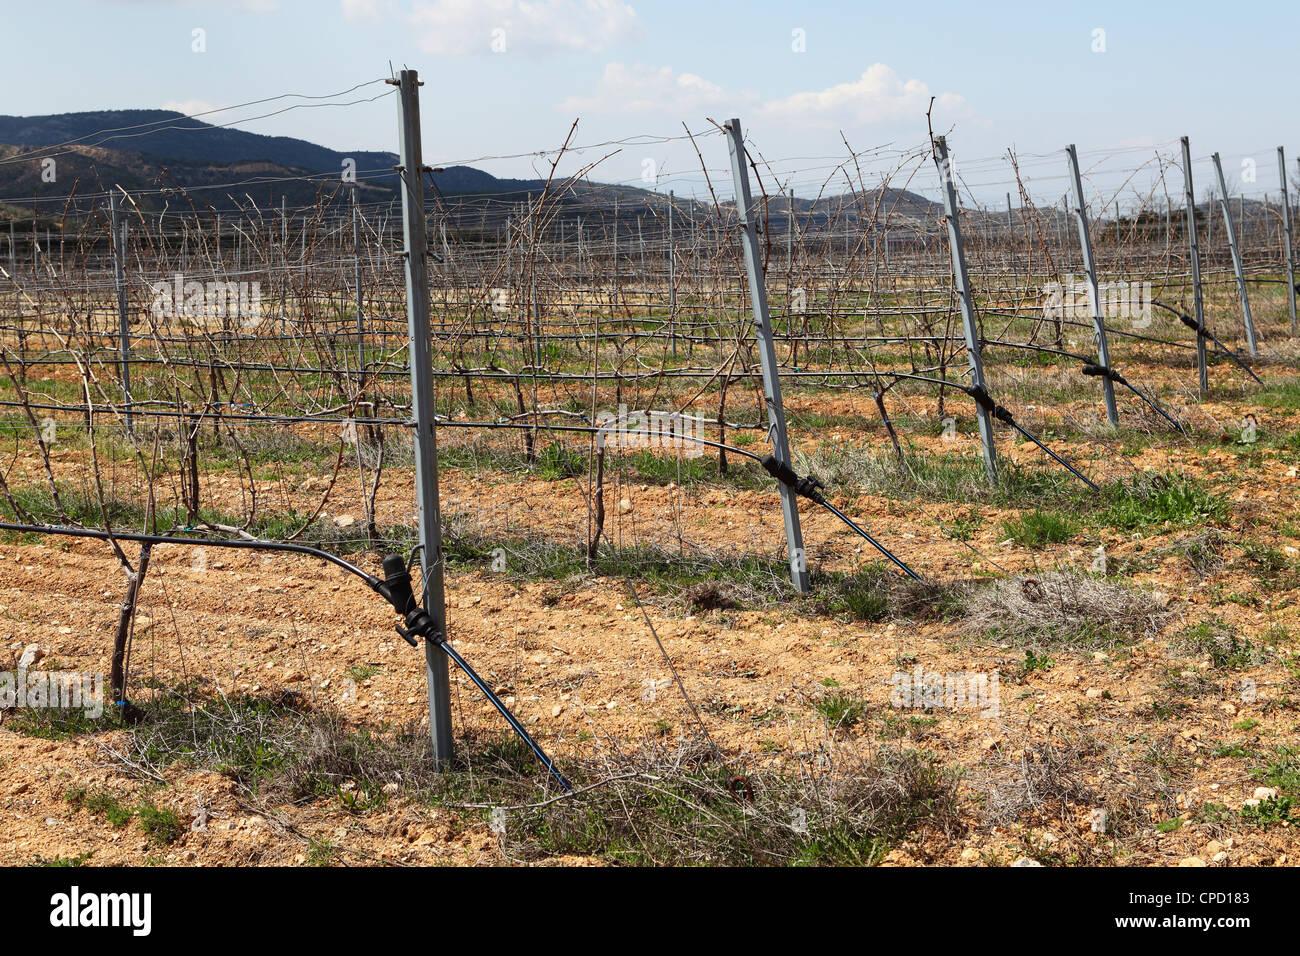 Greek vines early in the season. - Stock Image